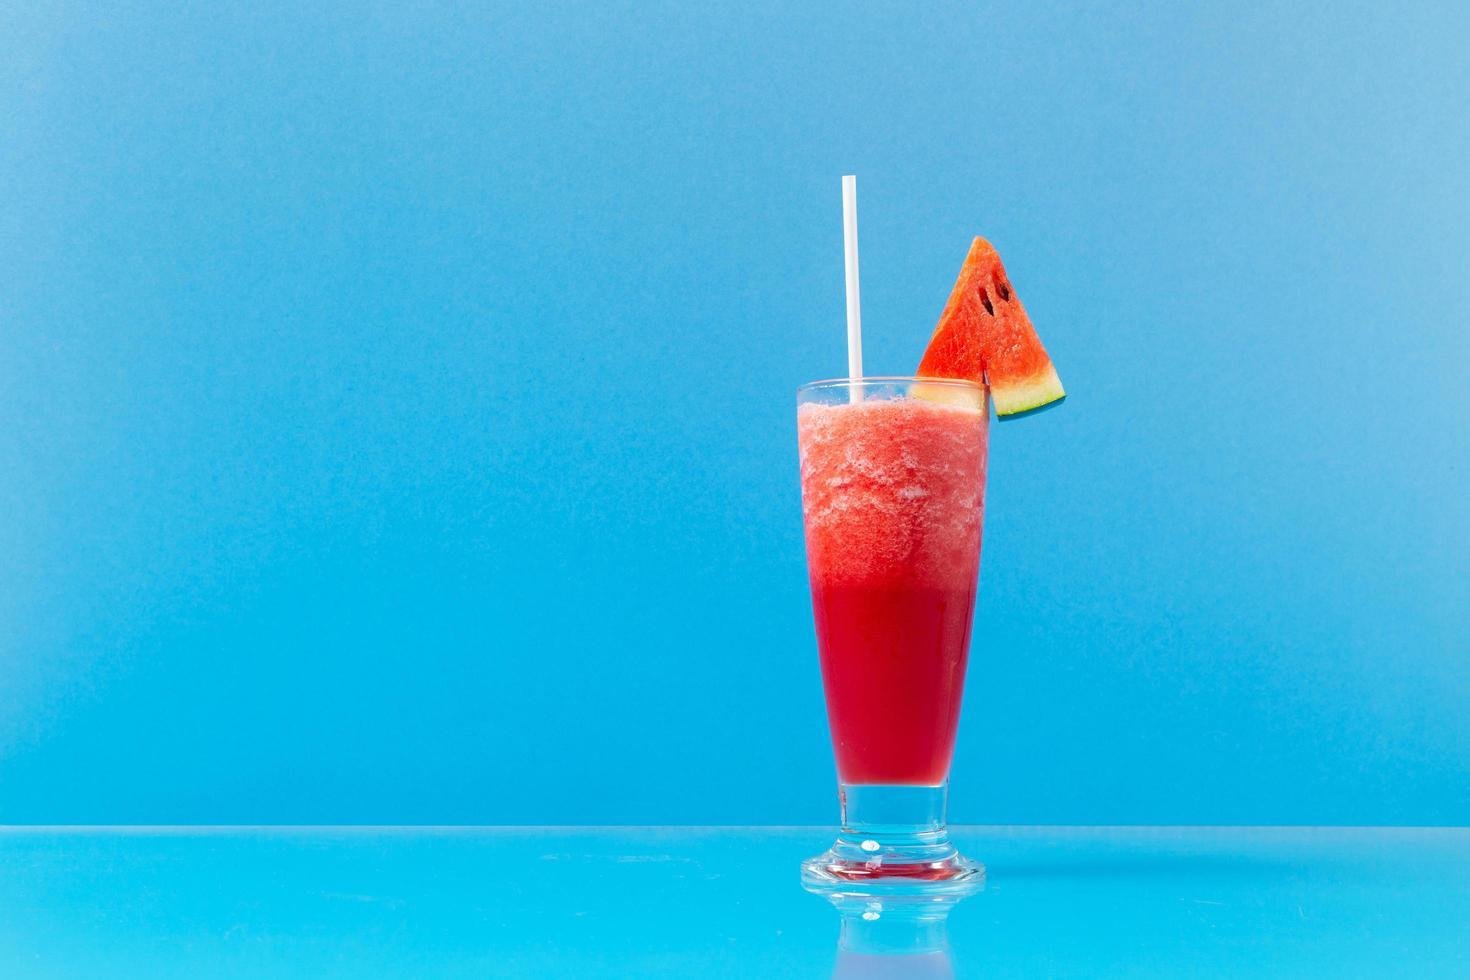 bebida de melancia fresca foto